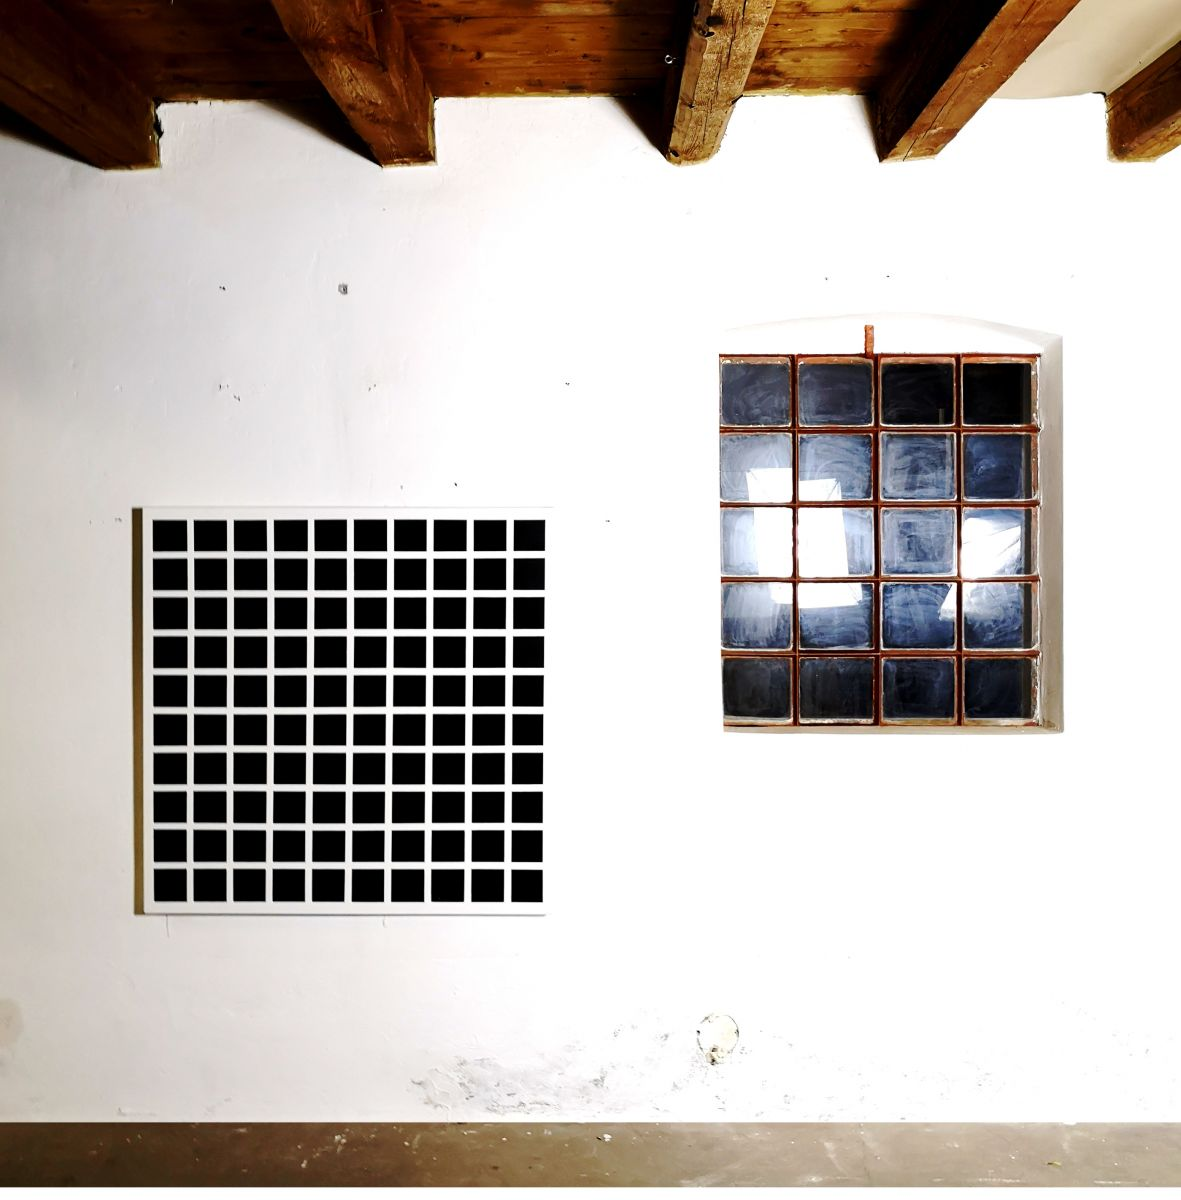 Artworks-exhibition-views Christian Eder